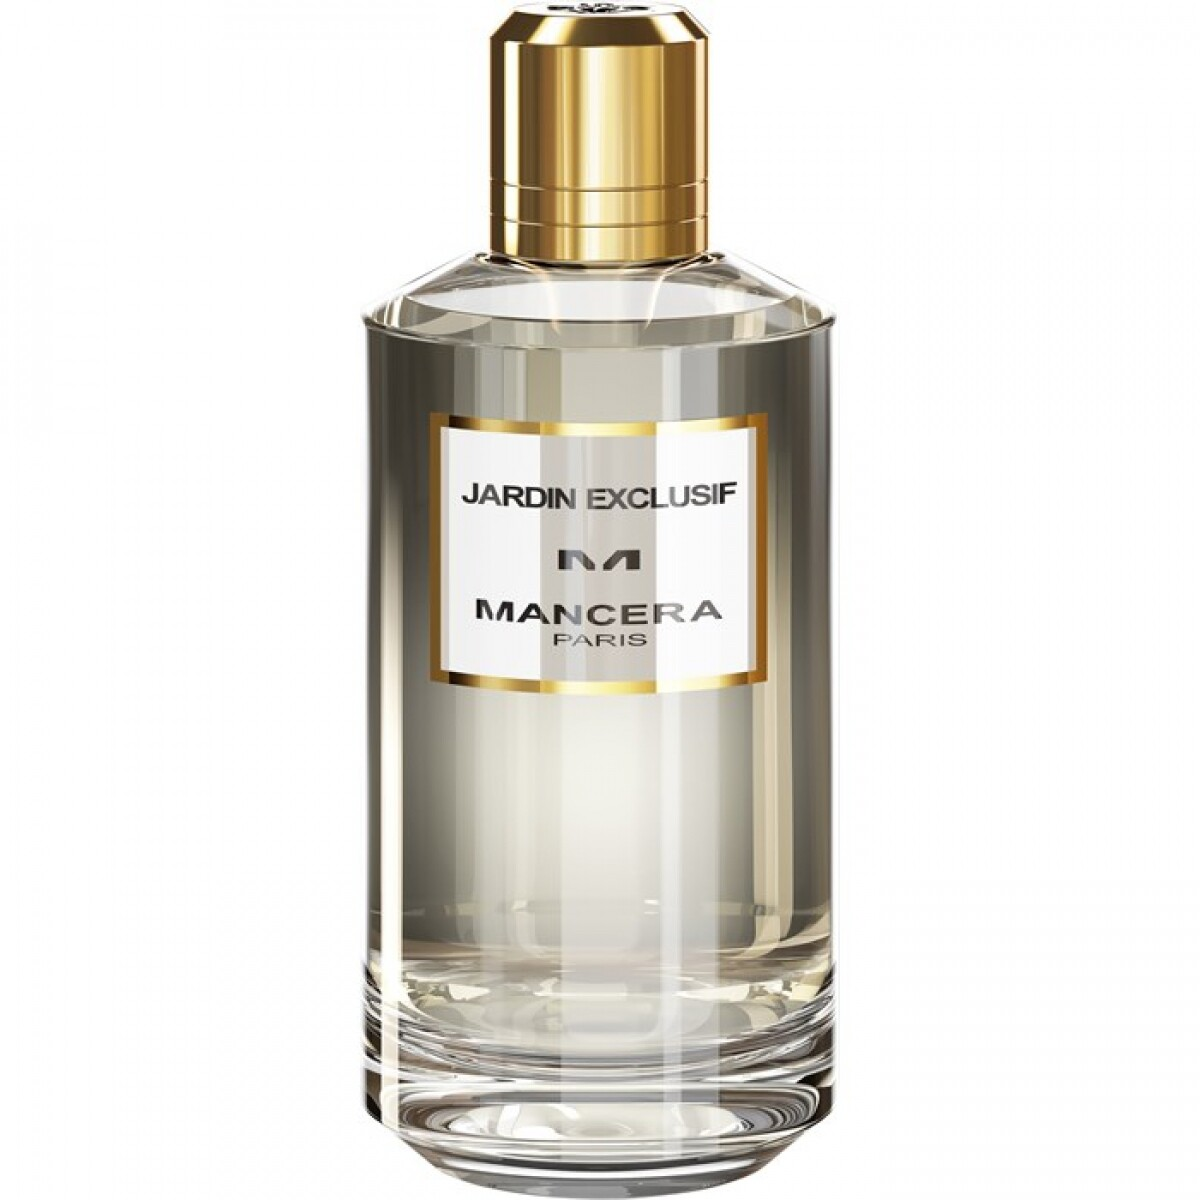 Mancera | Jardin Exclusif 120ml | Parfum |10263 diversen